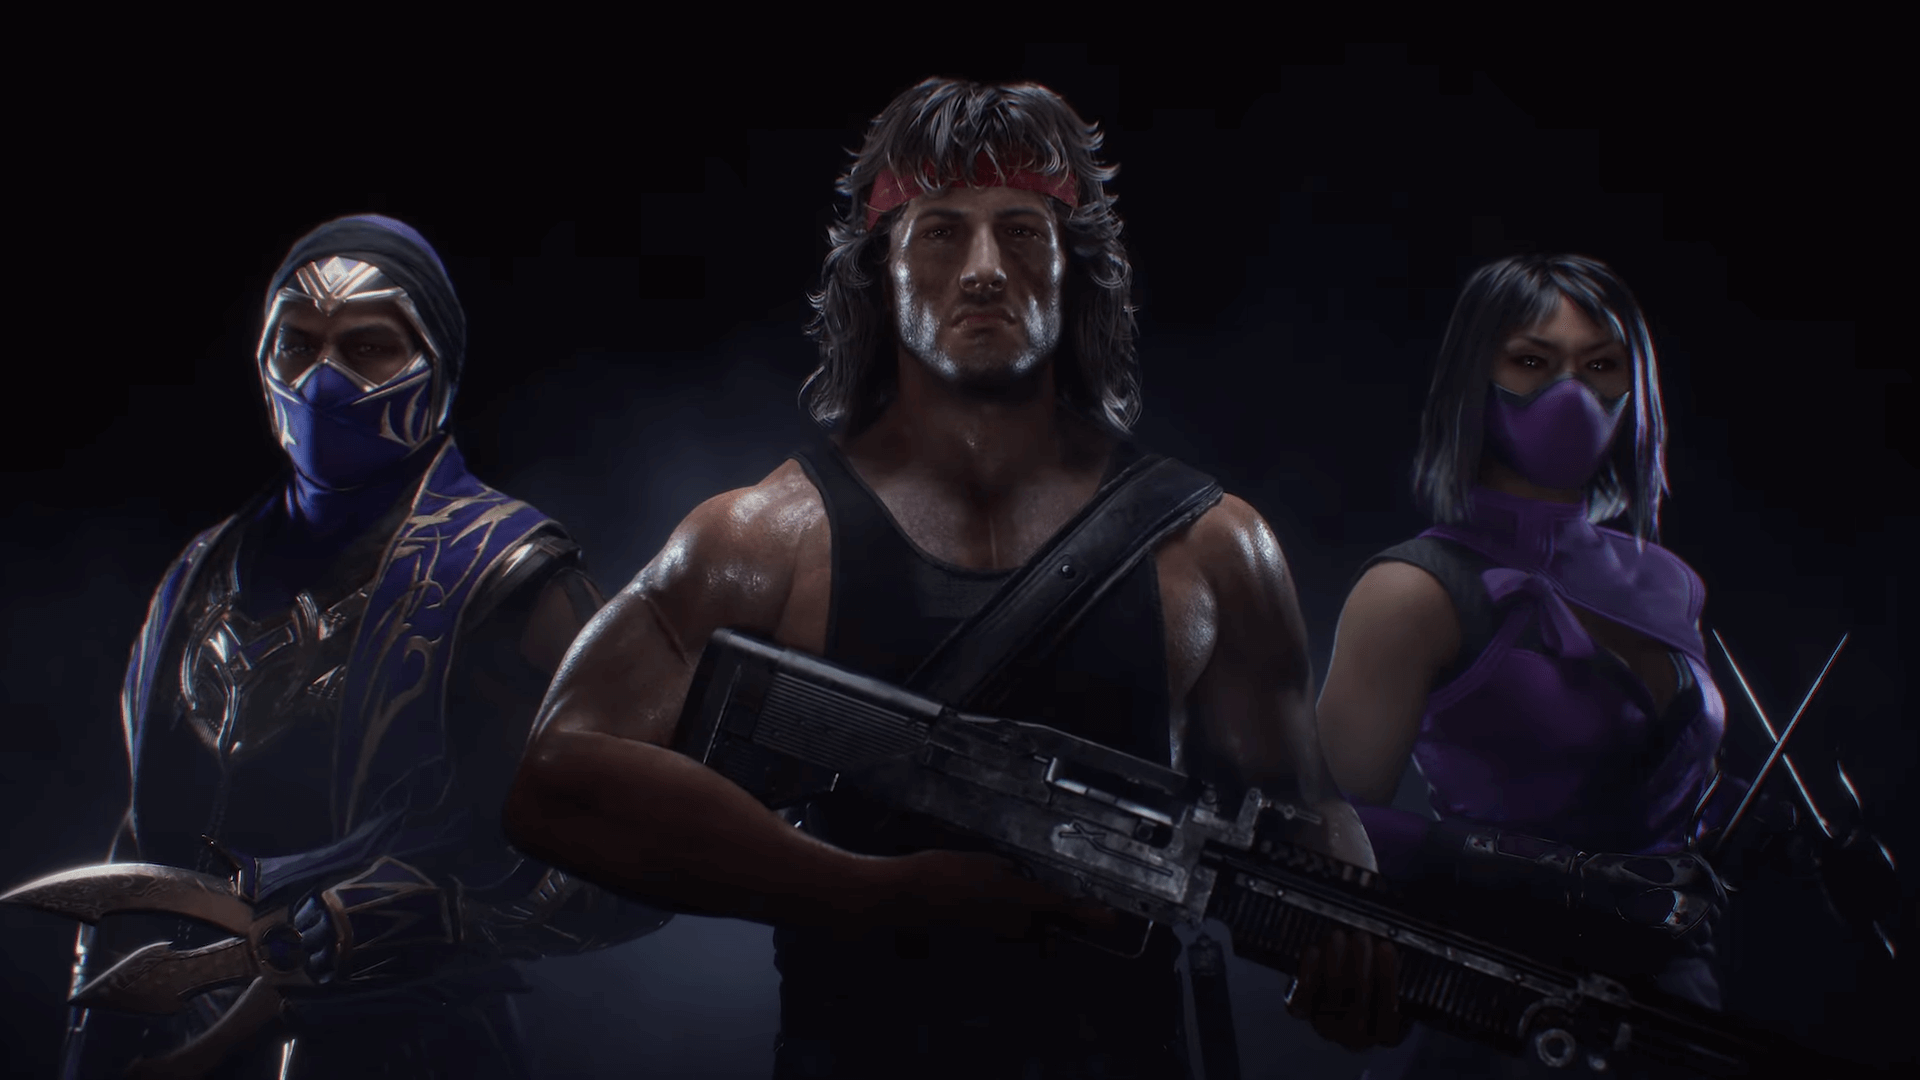 Mortal Kombat 11 Kombat Pack 2: Characters revealed